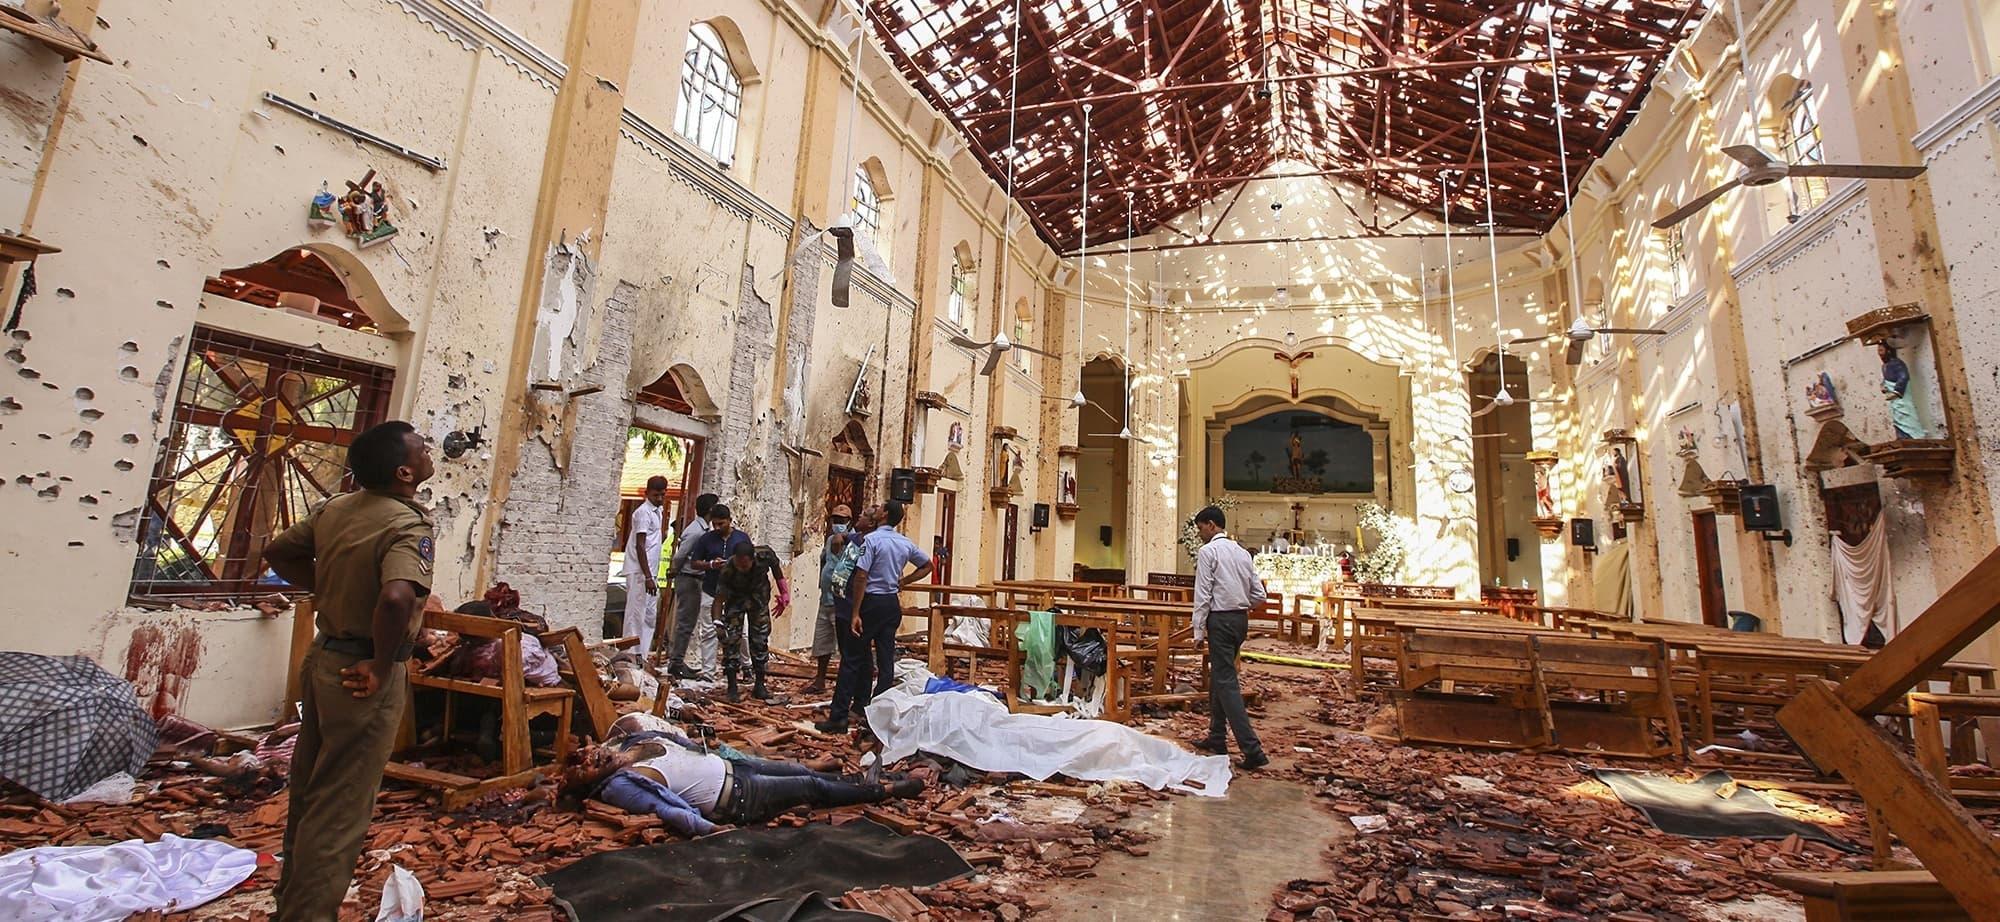 In Pictures: Gloom Cast Over Easter Celebrations After Explosions inside Liturgical Calendar In Sri Lanka